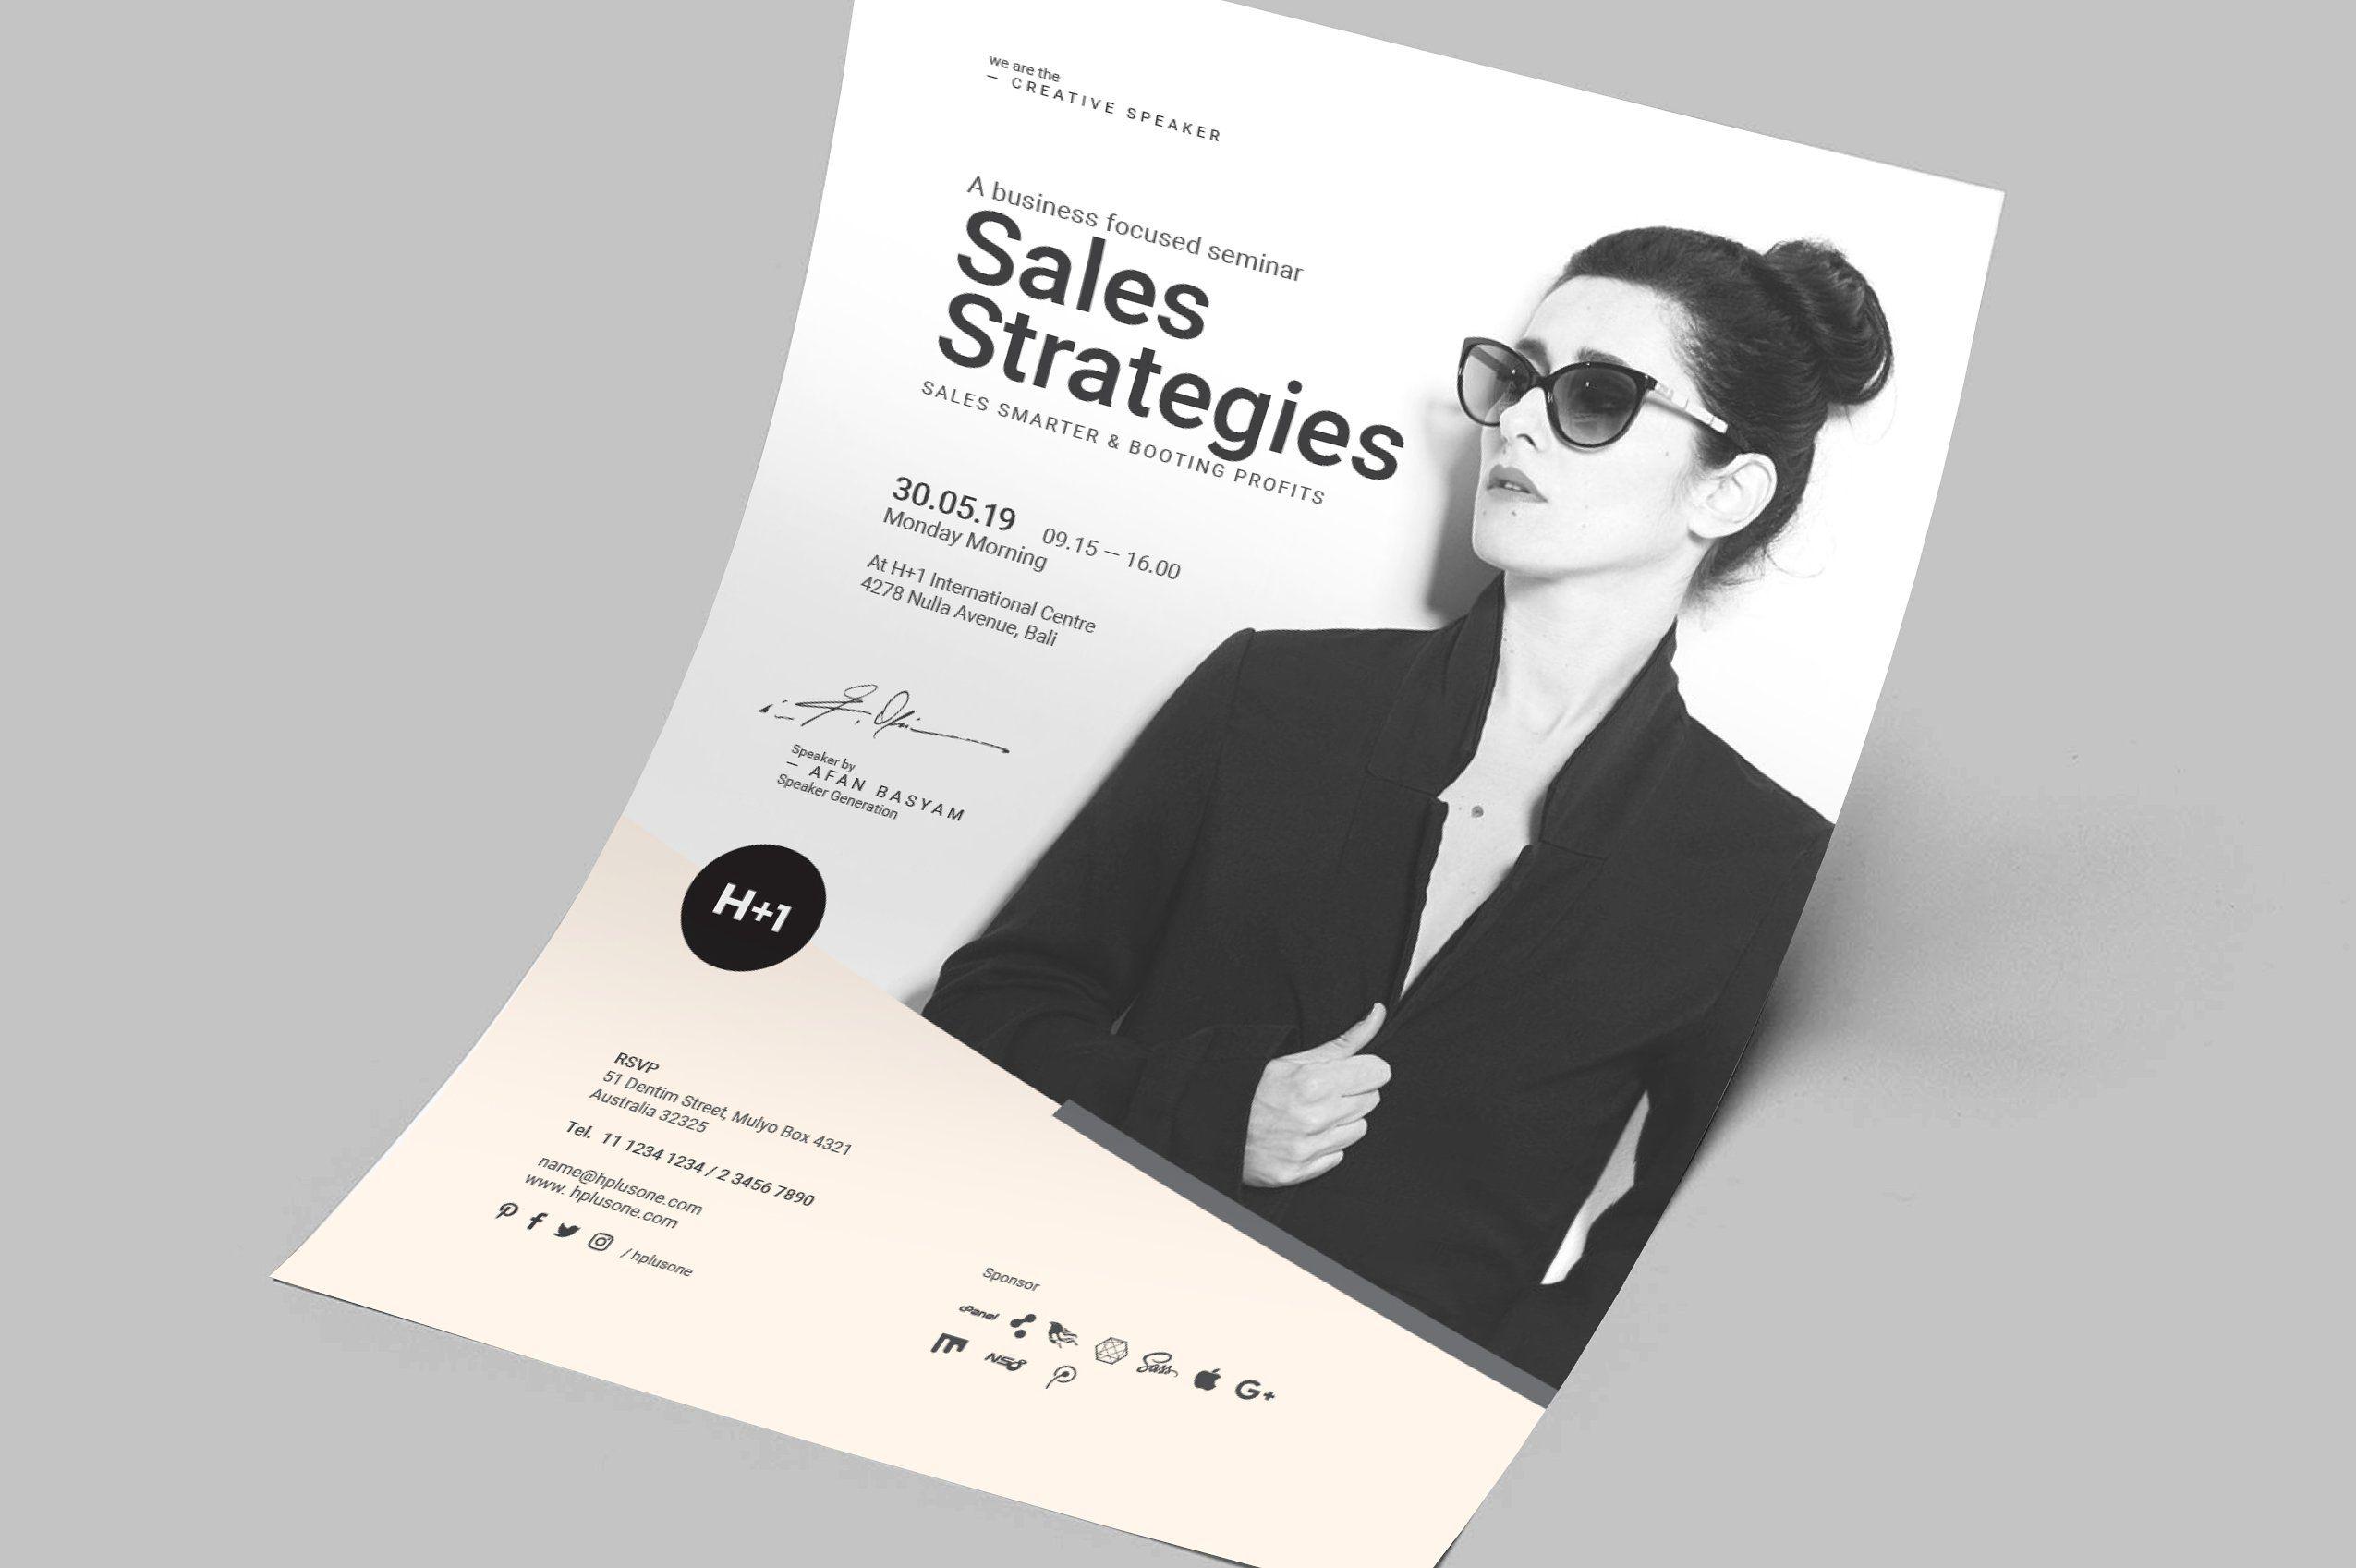 Seminar Posters Poster Design Design Template Poster Template